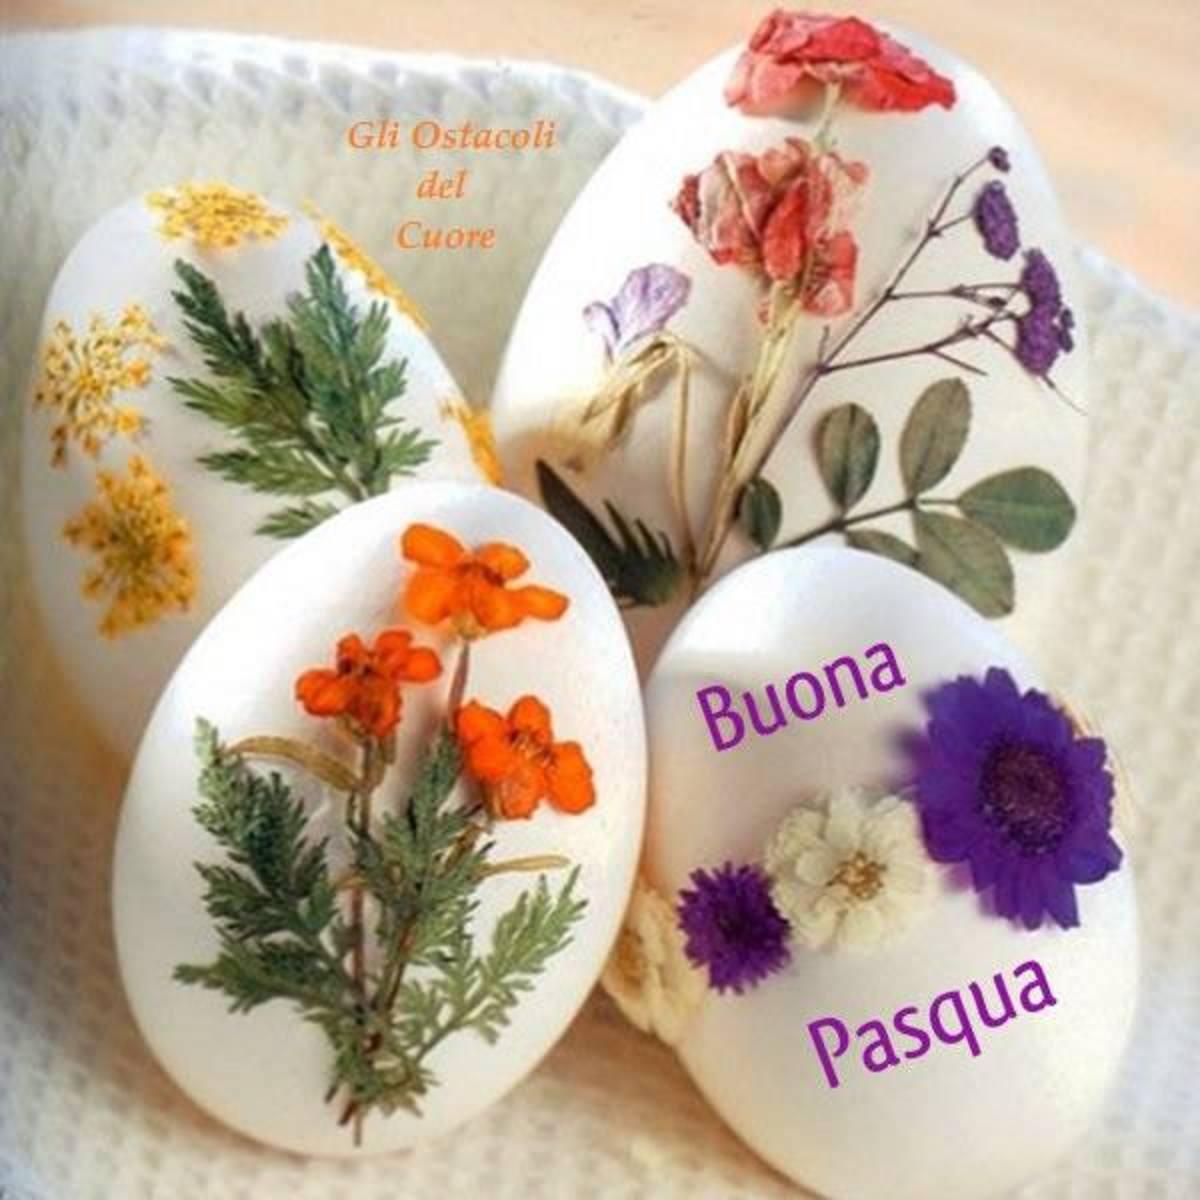 Buona Pasqua Frasi Belle Buongiornissimocaffeit